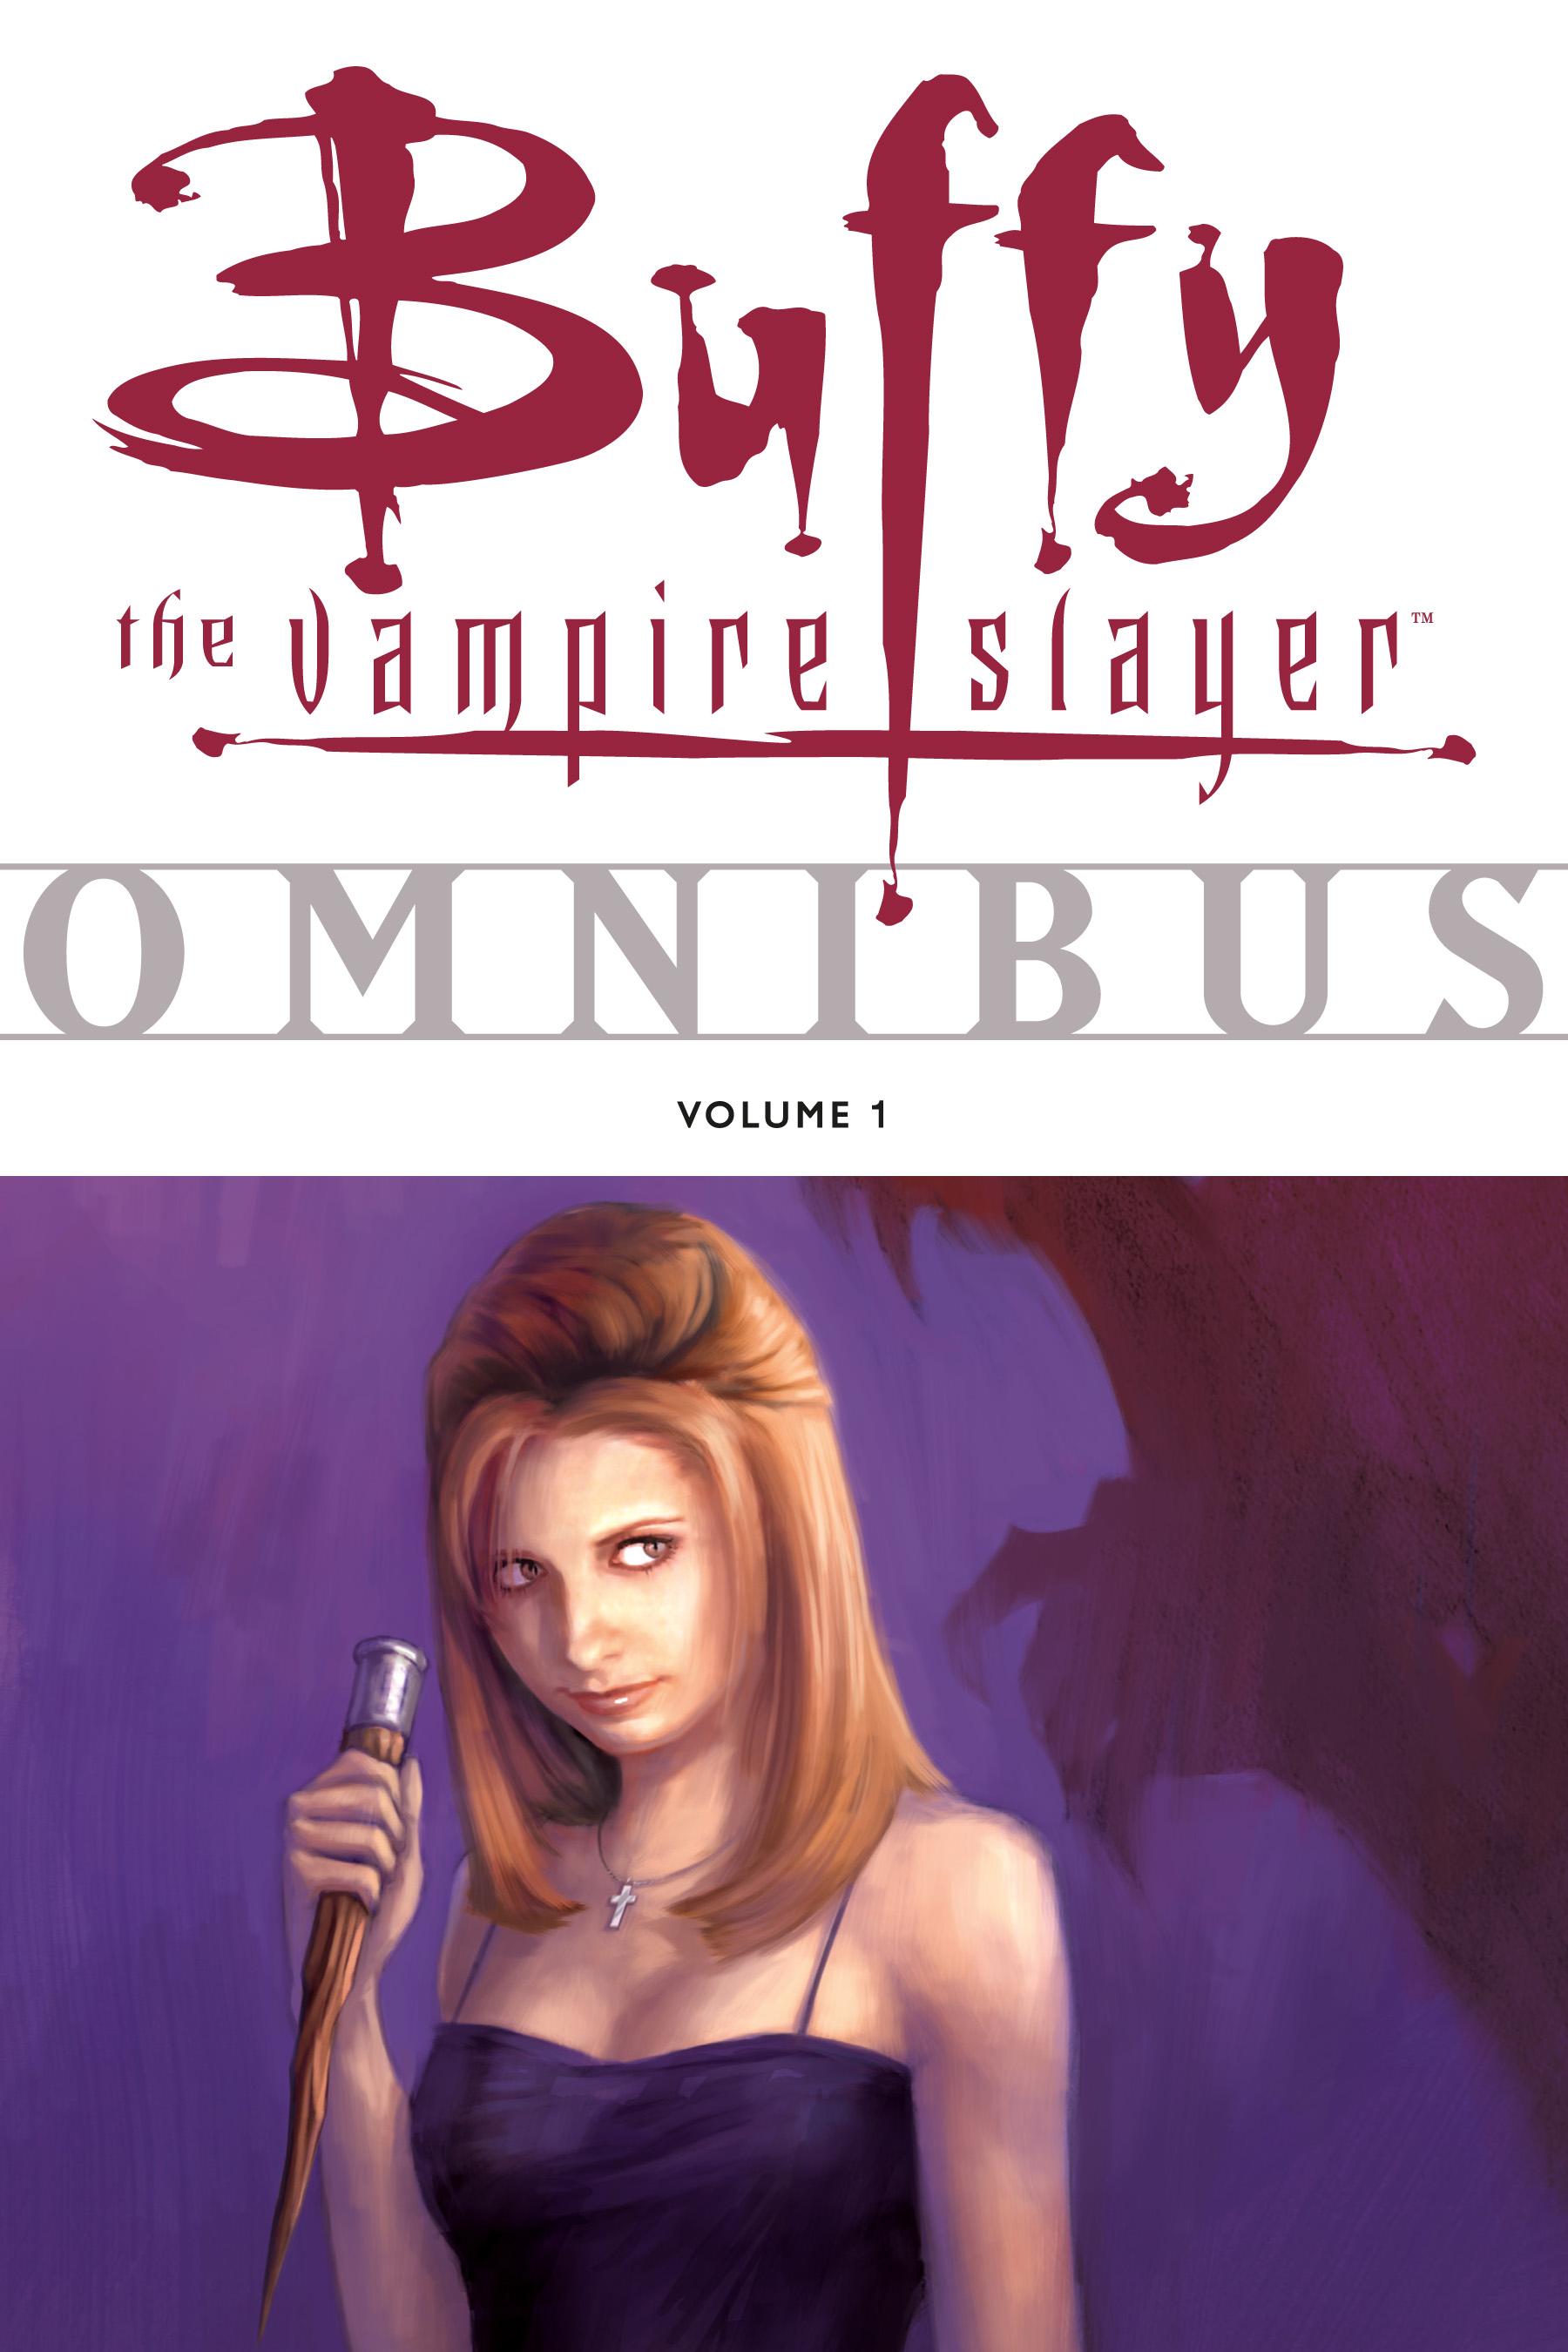 Read online Buffy the Vampire Slayer: Omnibus comic -  Issue # TPB 1 - 1